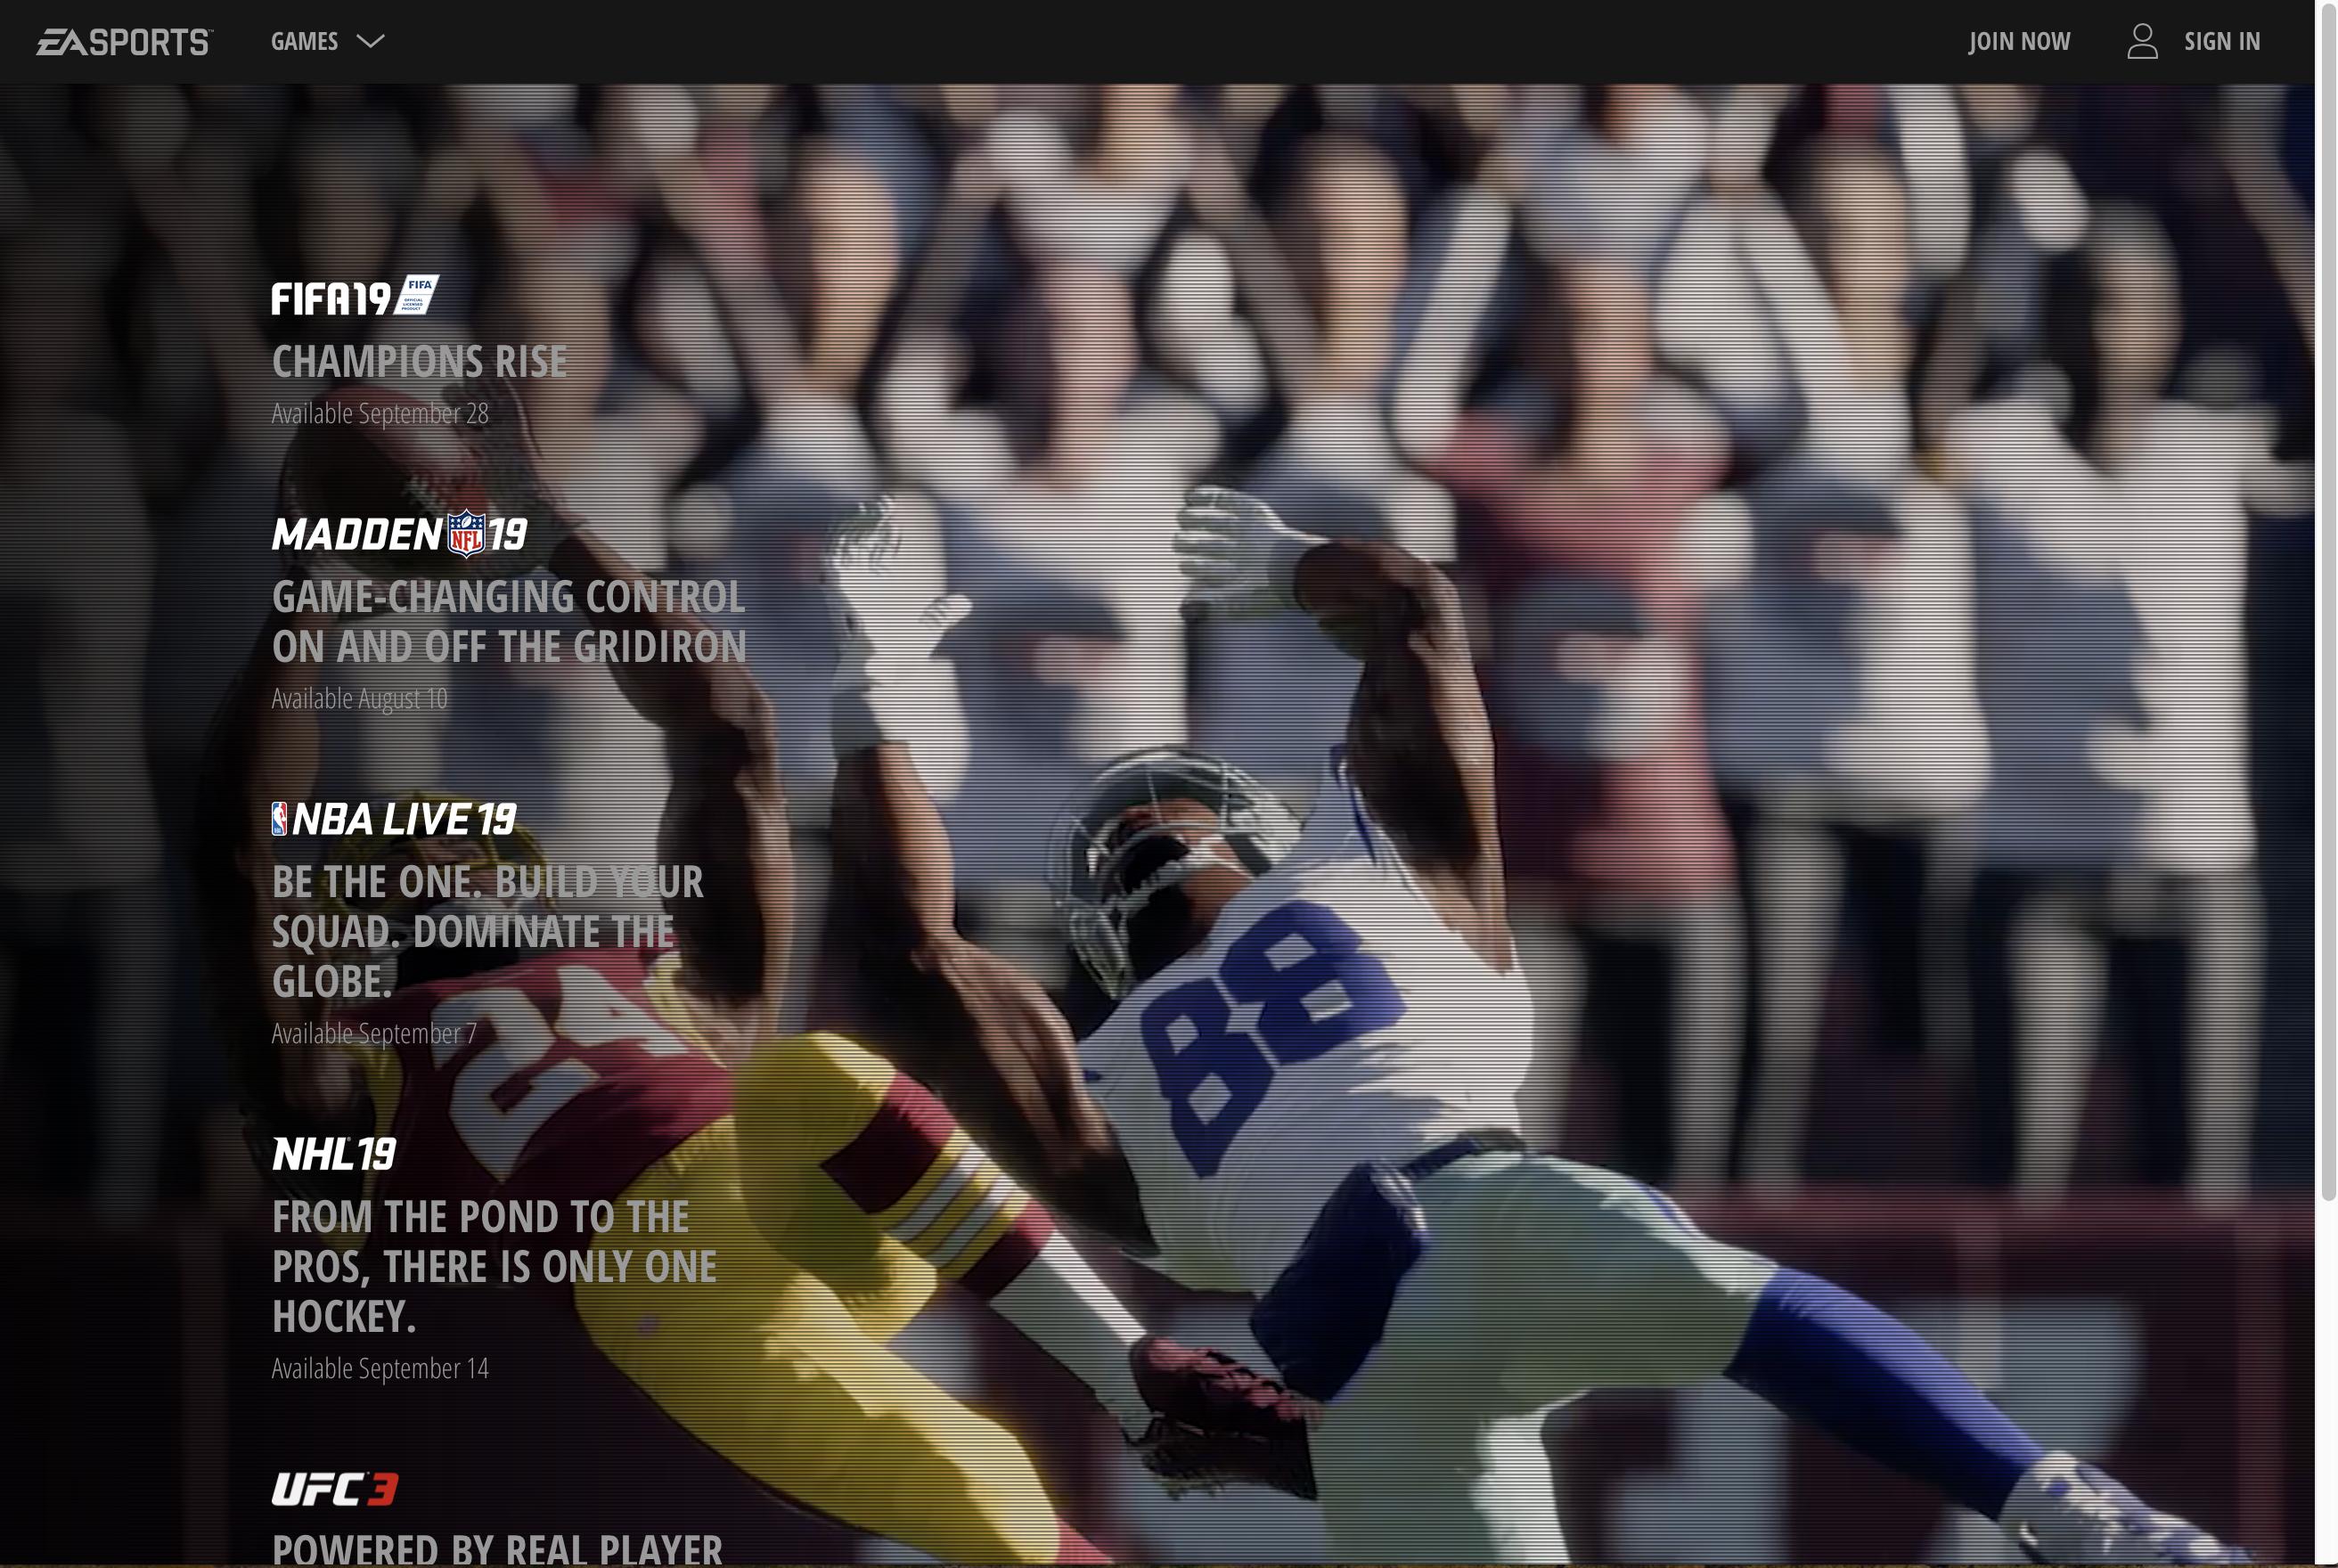 Ea Website Ufc sport, Sports video game, Ea sports